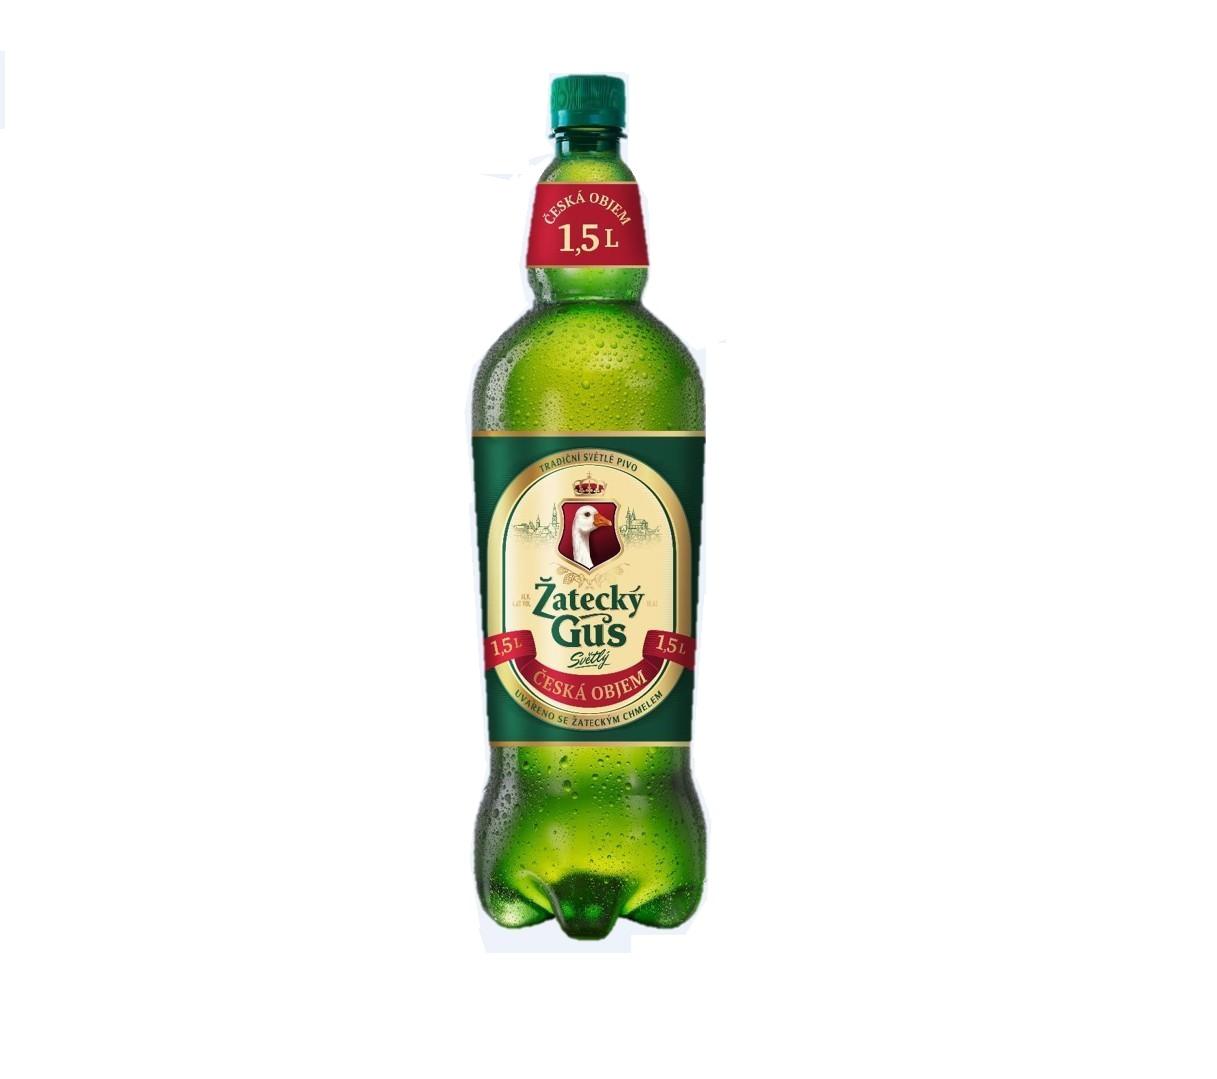 Пиво «Жатецкий гусь» 1,5 пл/б